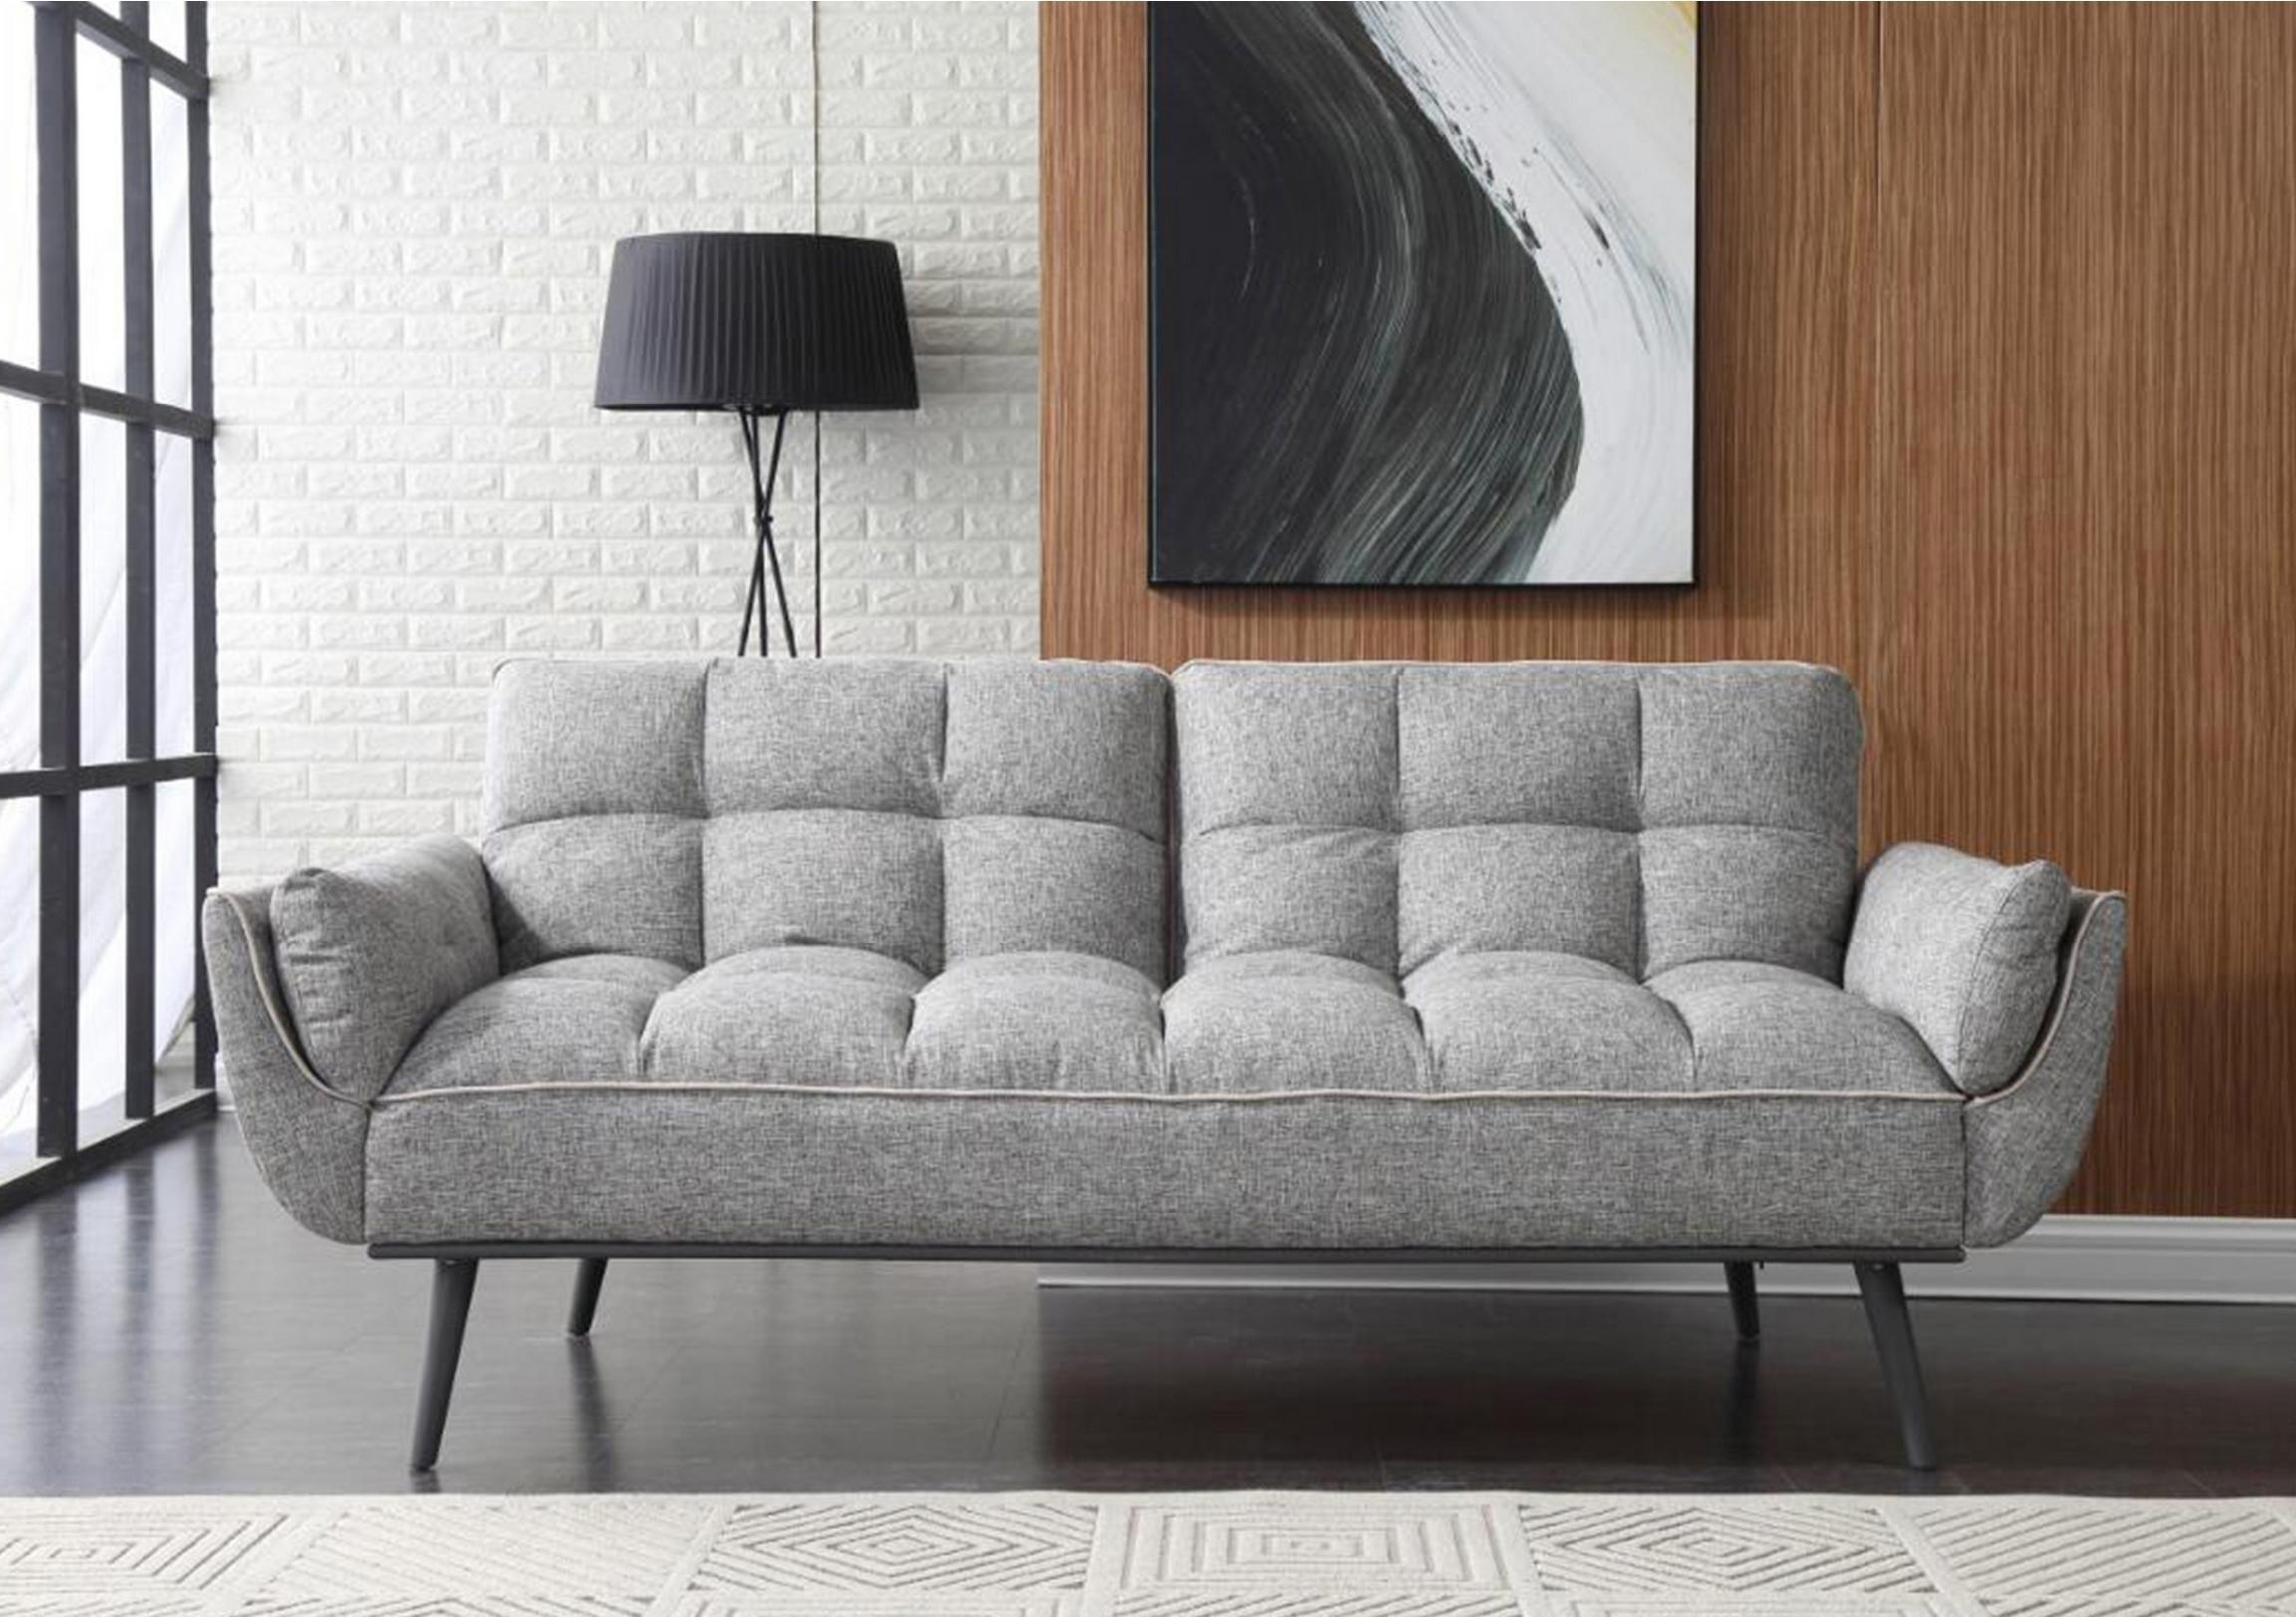 Fabulously stylish modern sofa bed with cushioned